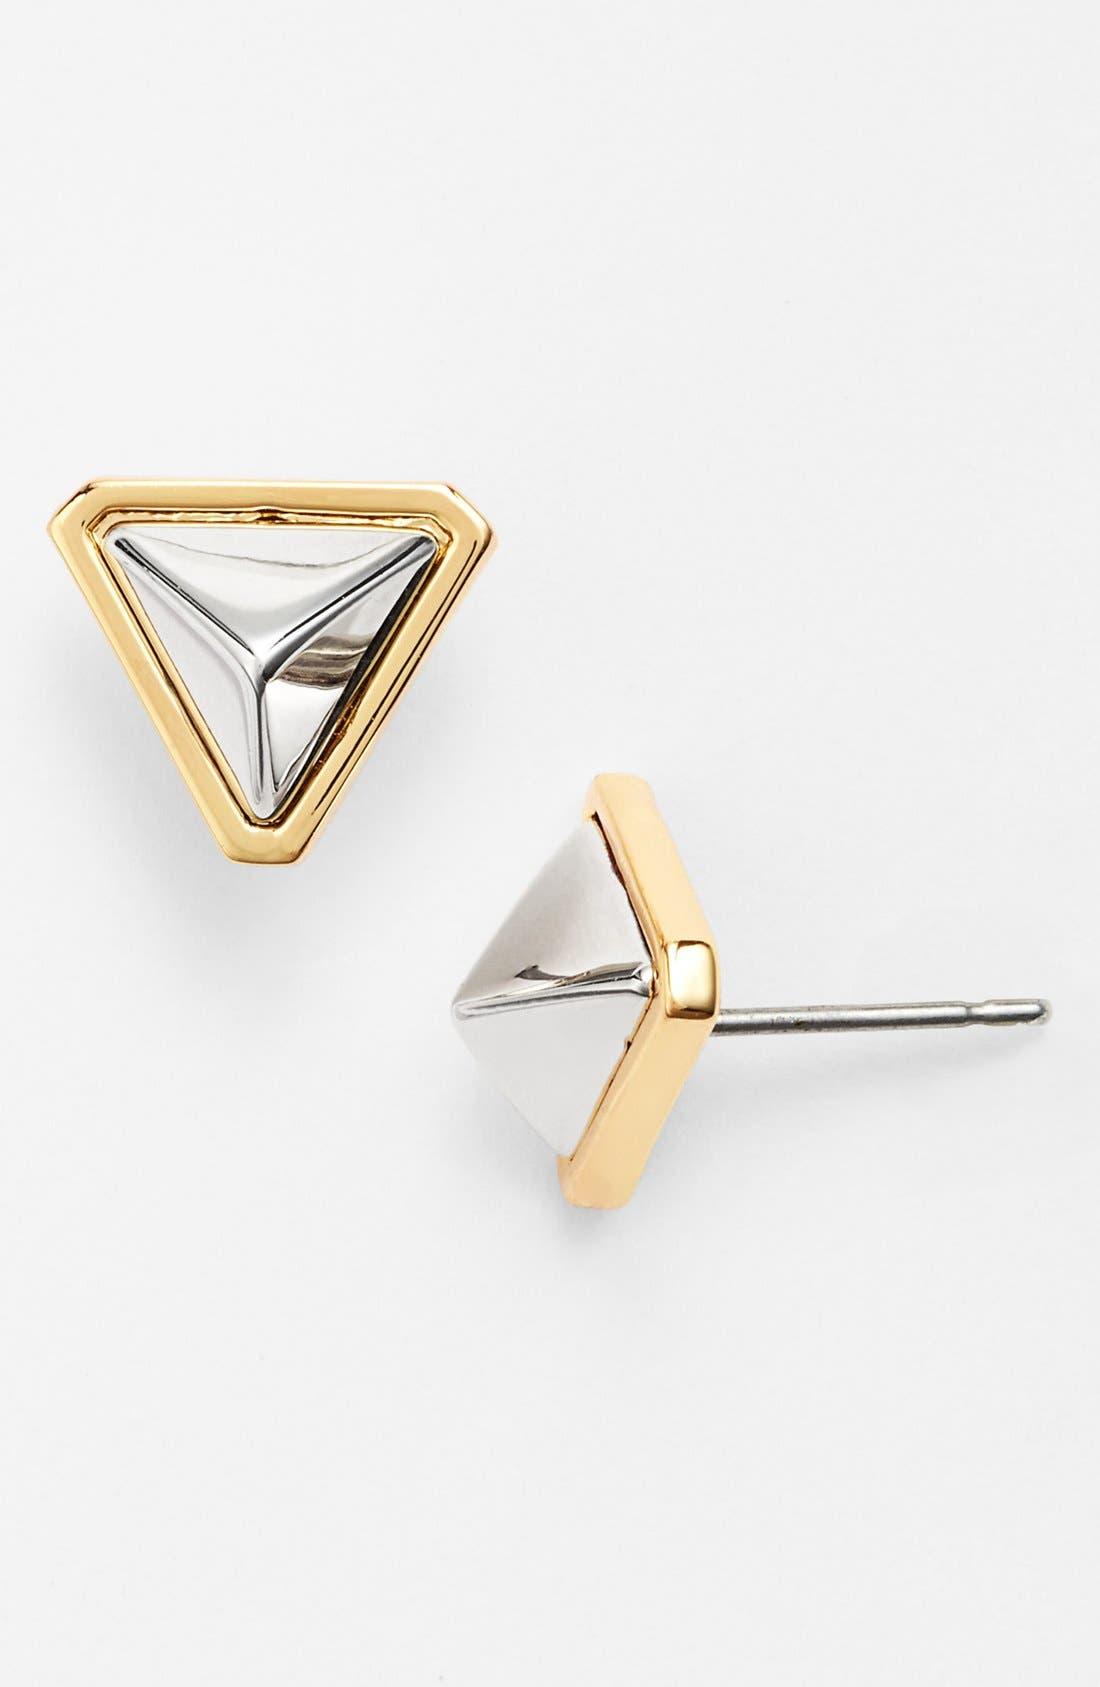 Alternate Image 1 Selected - Vince Camuto 'Mayan Metals' Stud Earrings